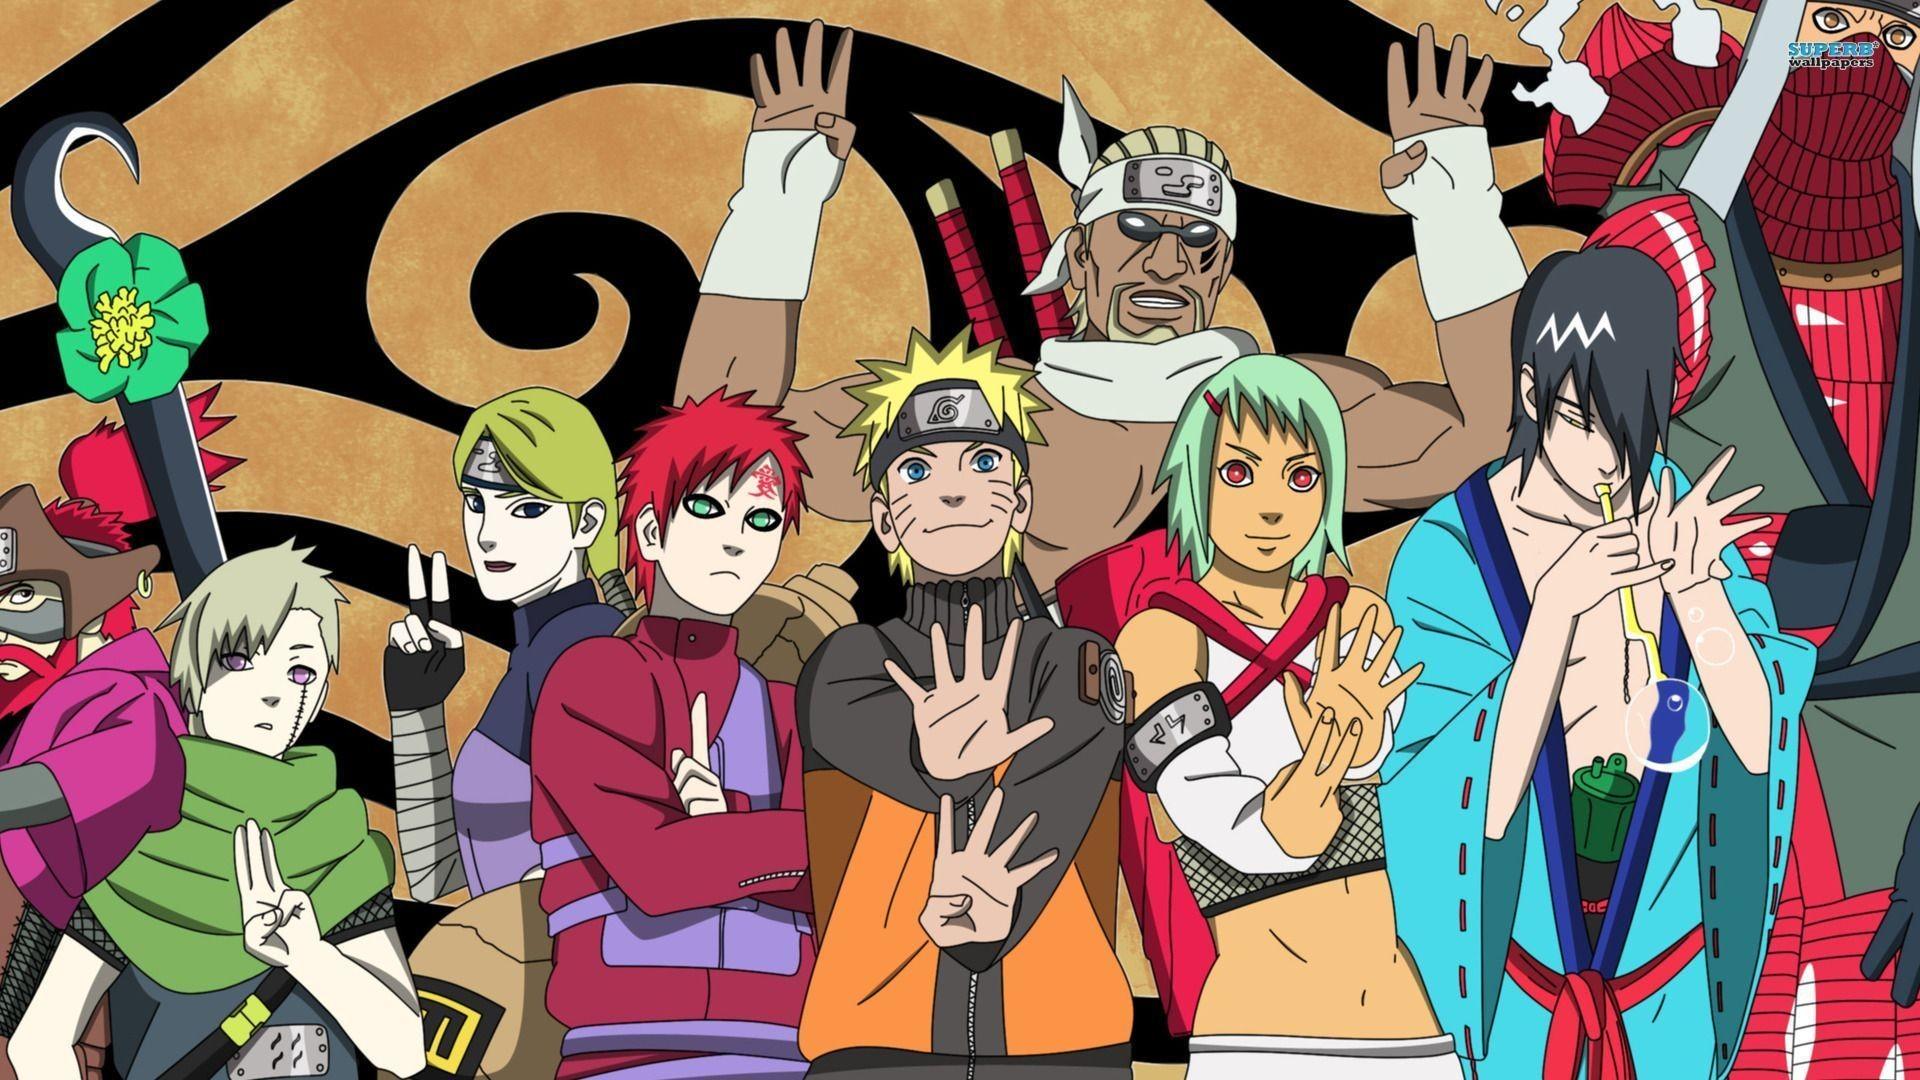 Naruto Wallpaper 1080p #003 ~ Wallpaper Petakilan.com